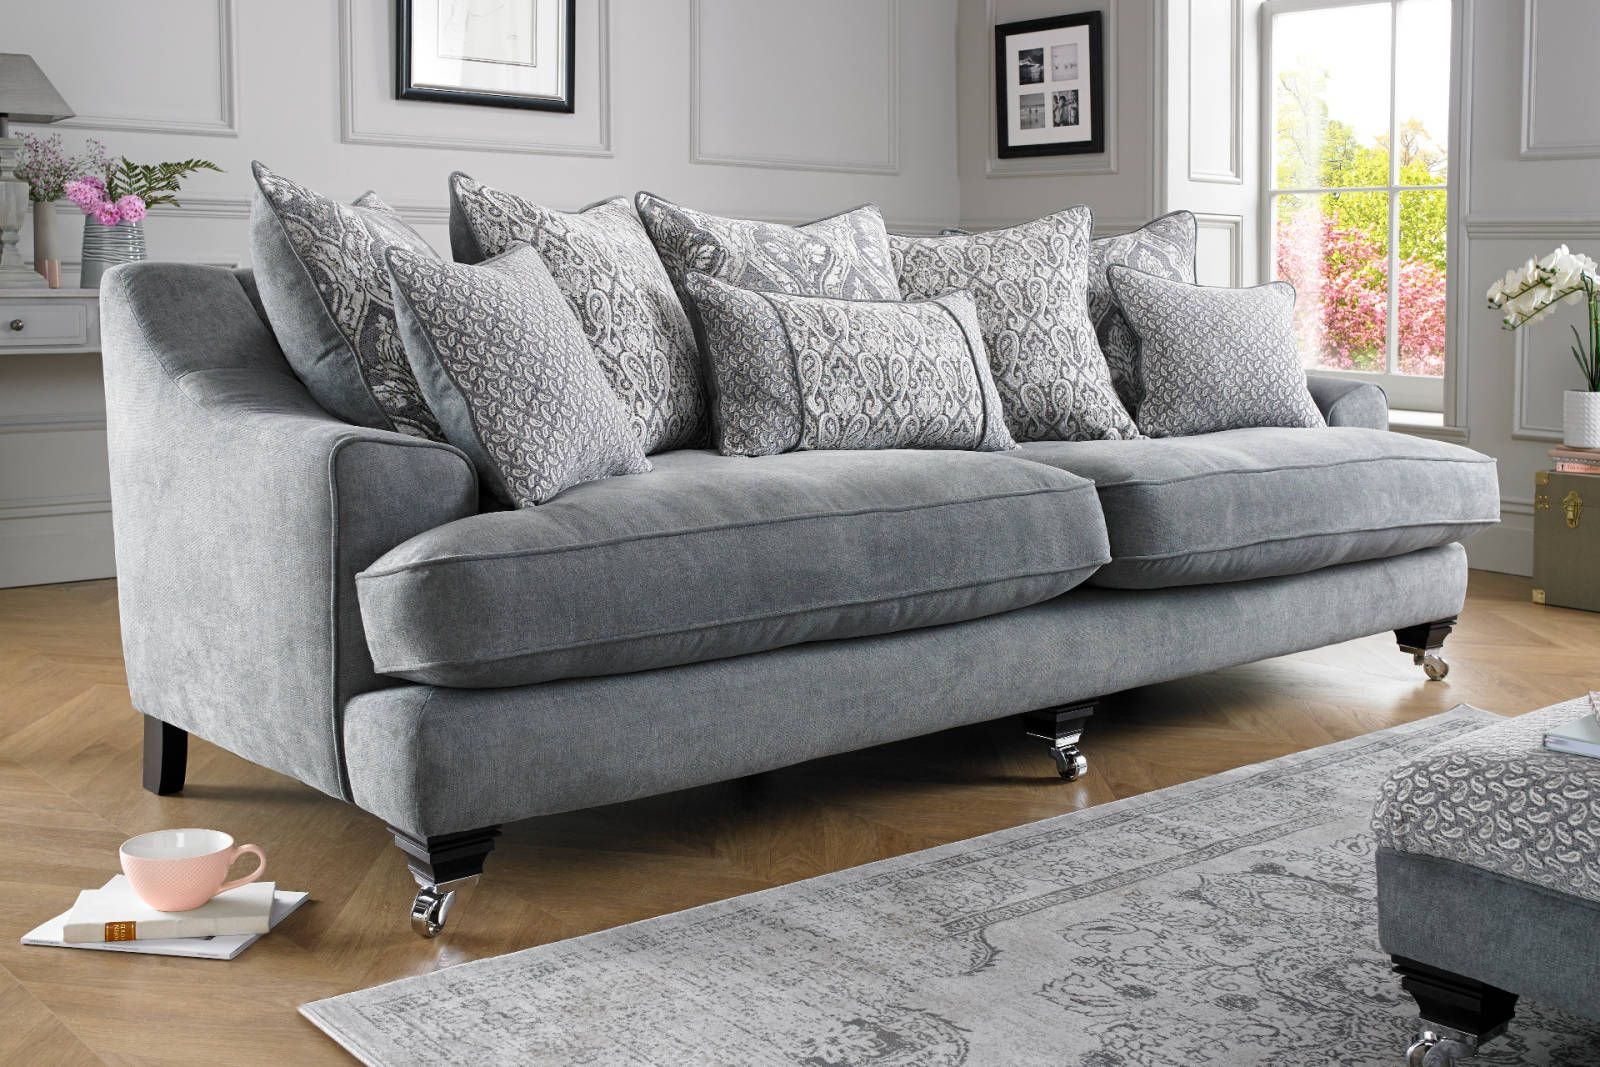 Bergen | Sofology | Sofa, Fabric sofa, Sofa bed